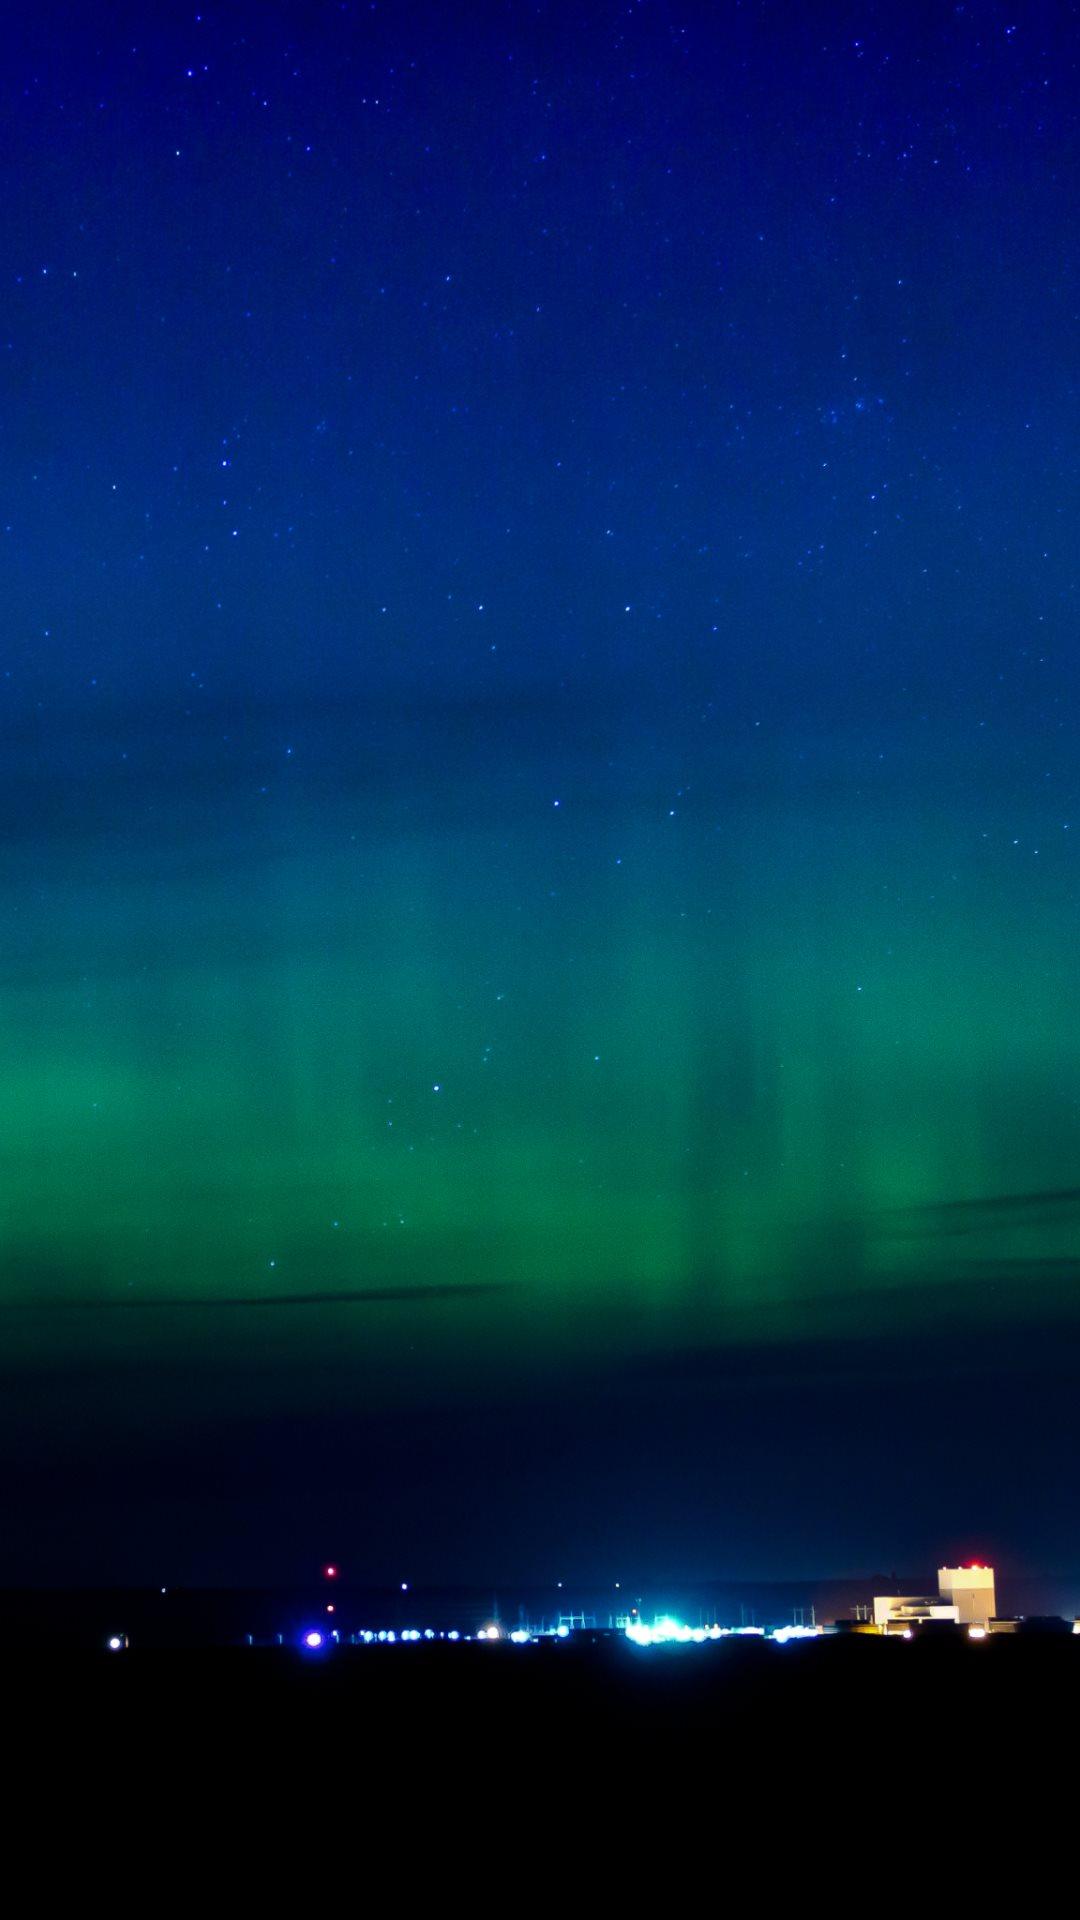 northern lights wallpaper 4k - photo #34